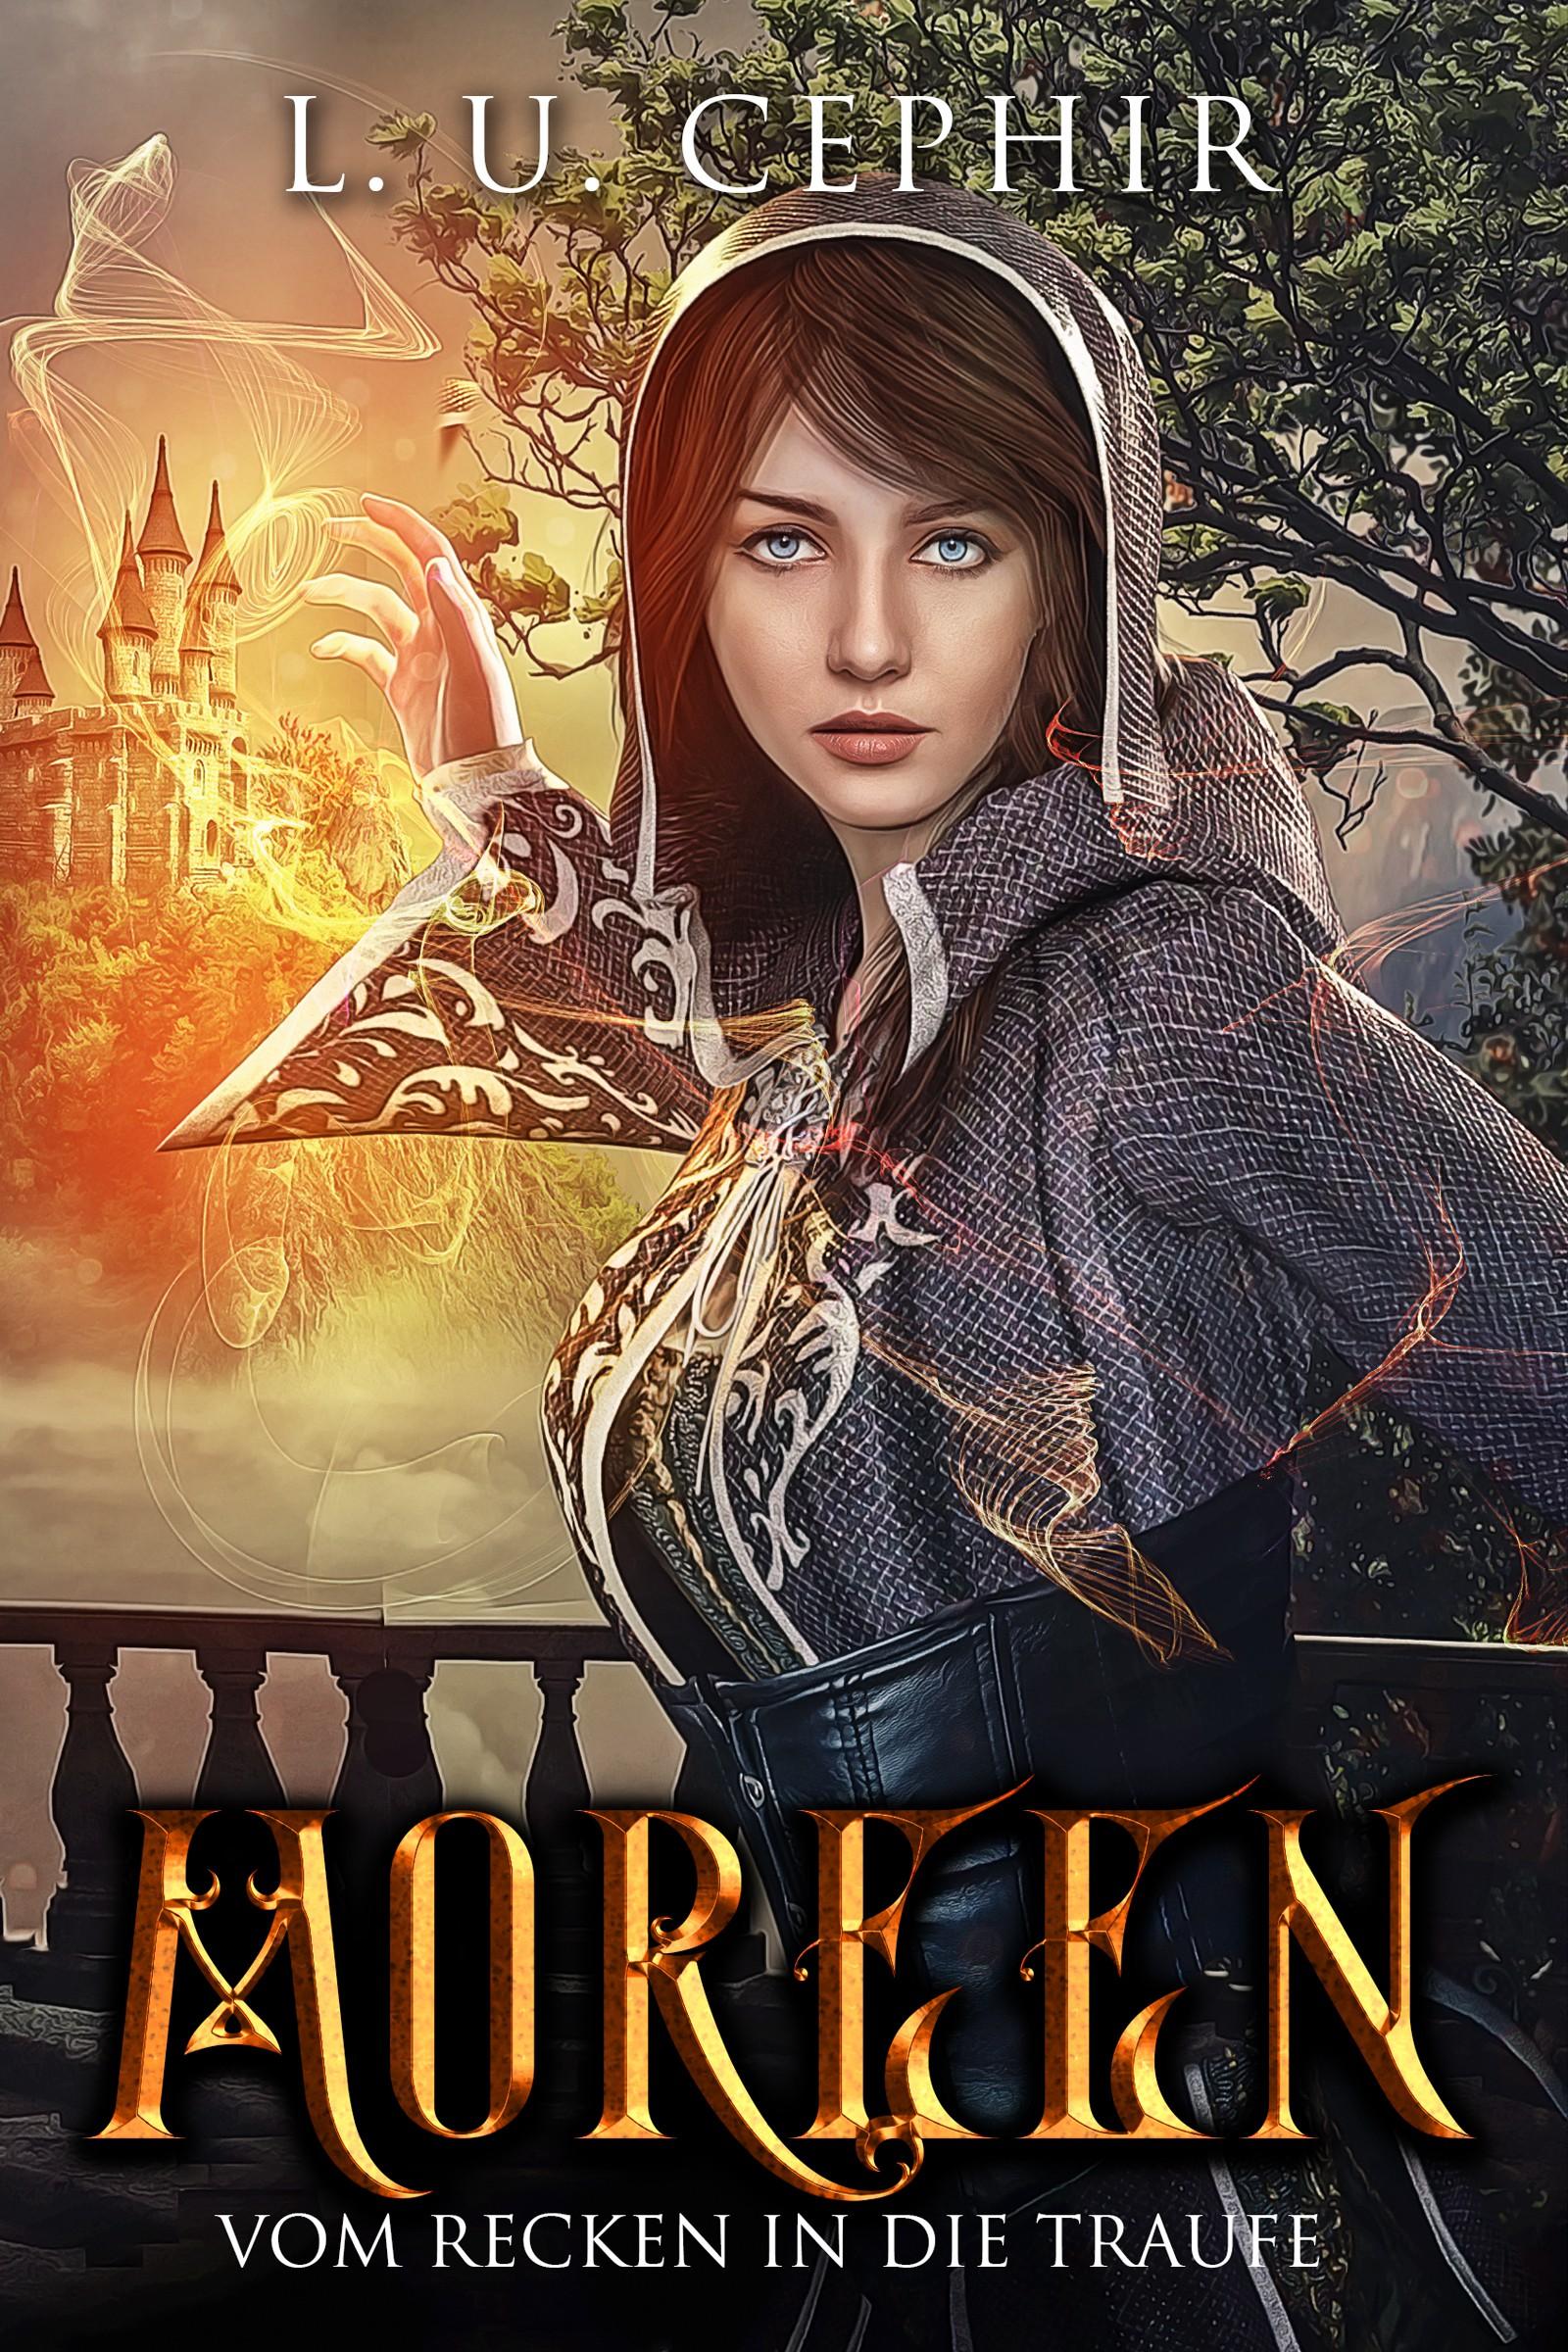 YA fantasy romance needs an intriguing eBook cover